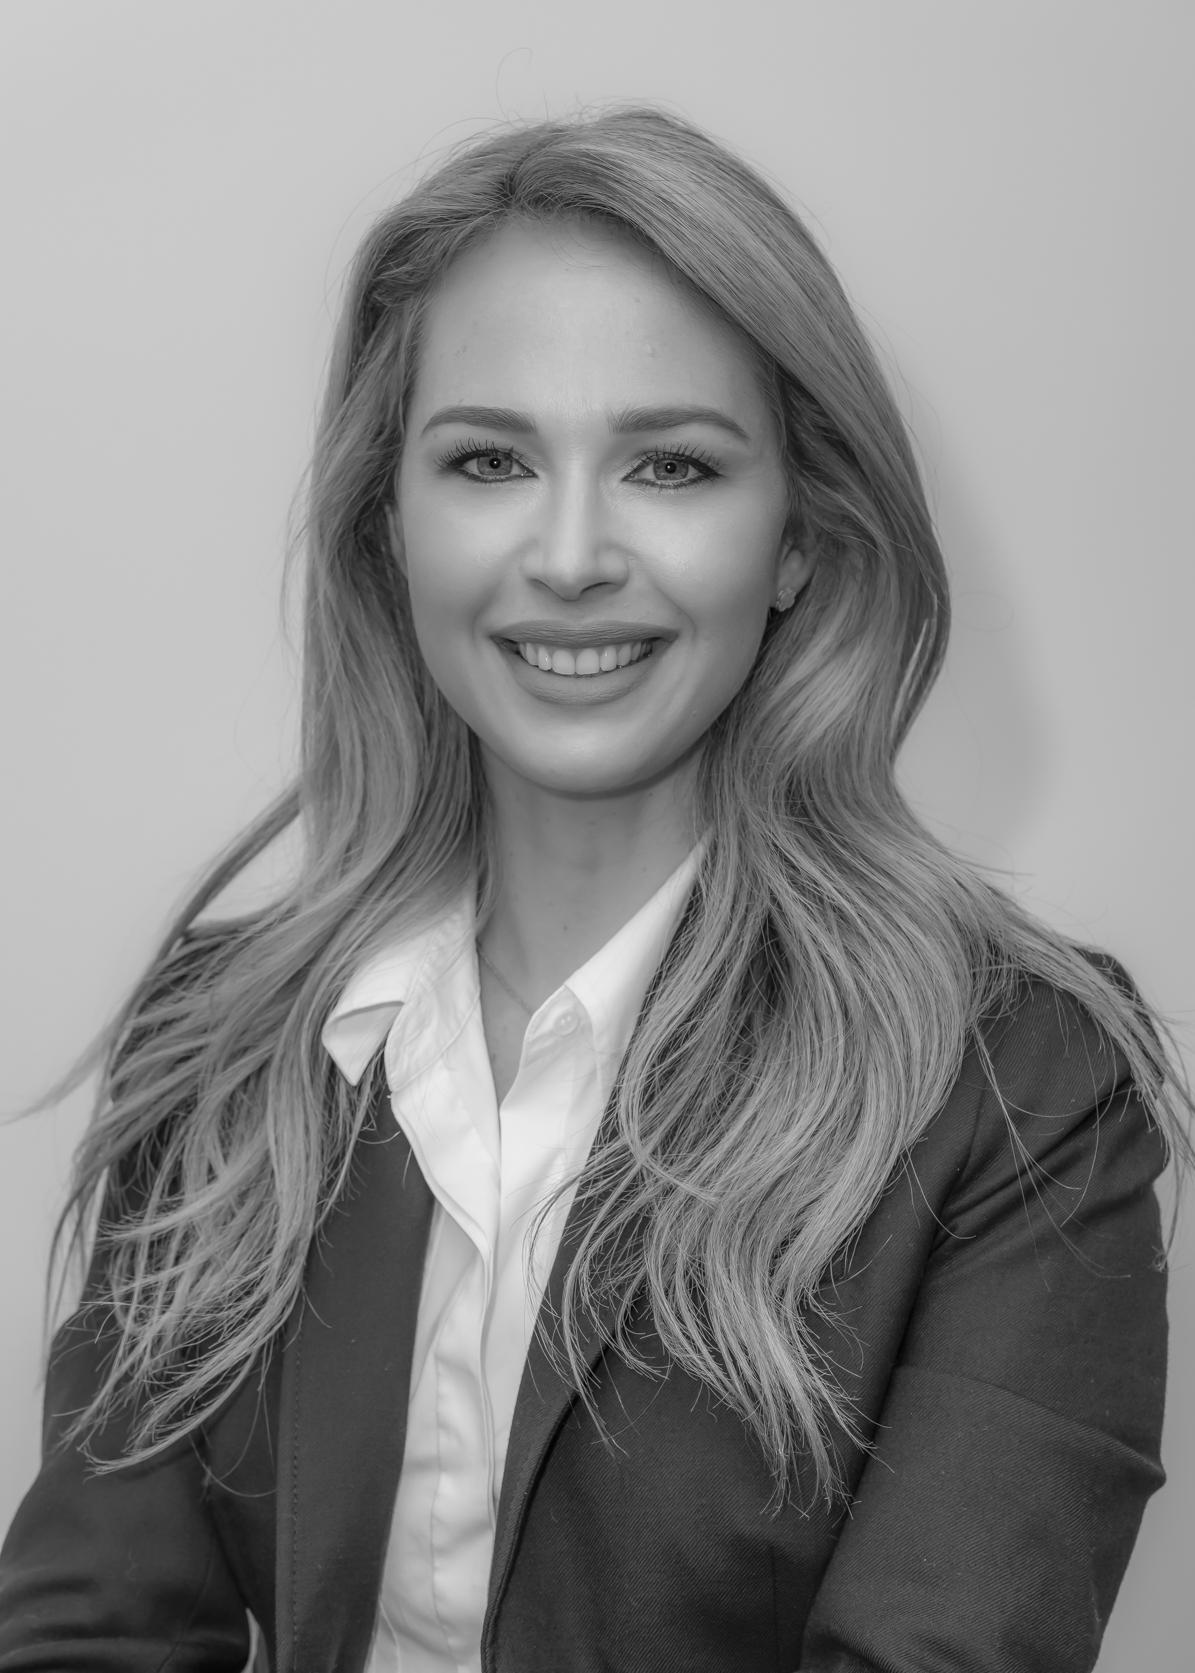 Anabella Diaz Rivera